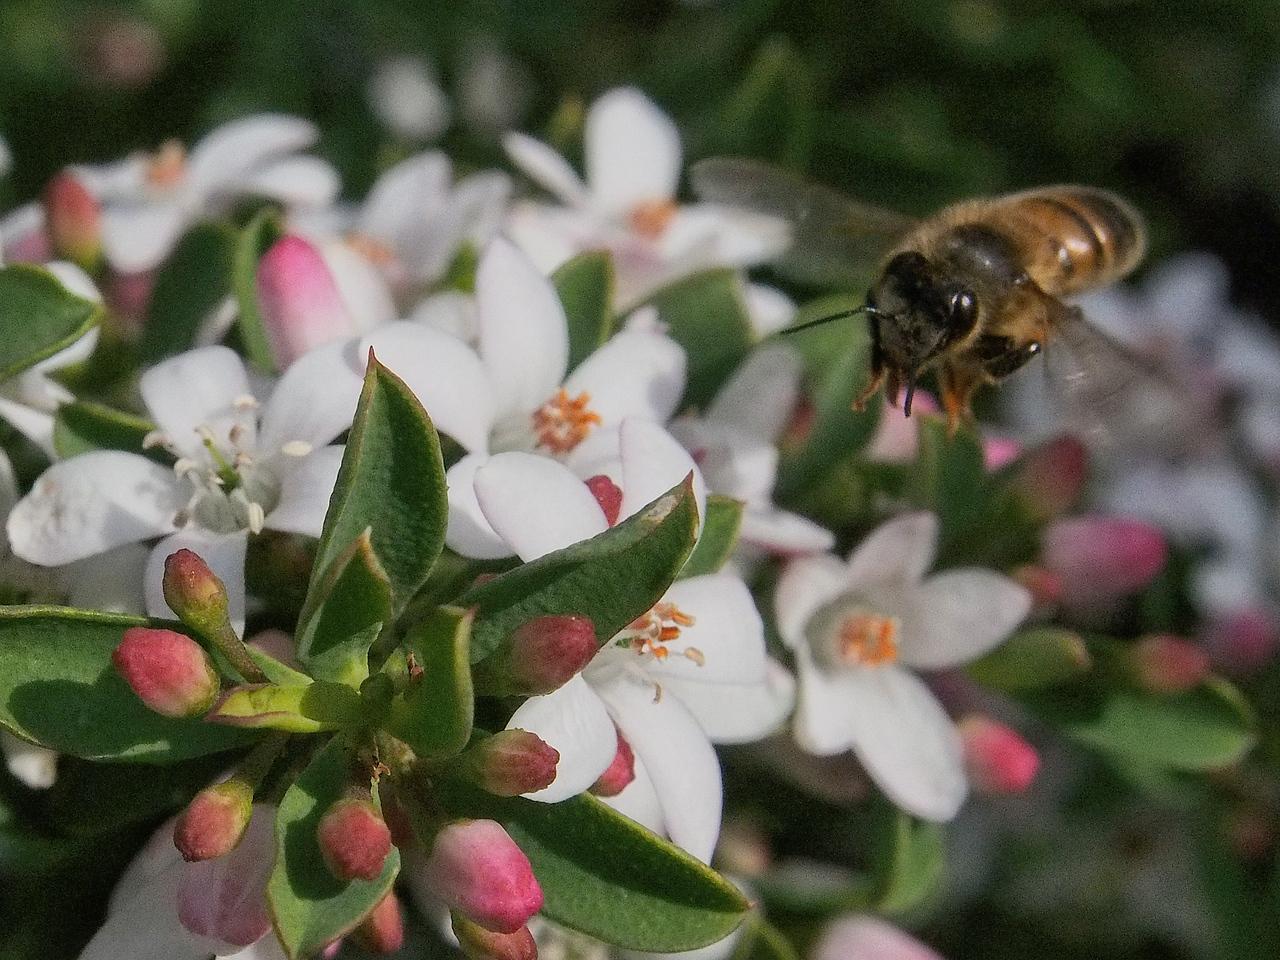 20130901_1218_1719 Kew Baptist bee